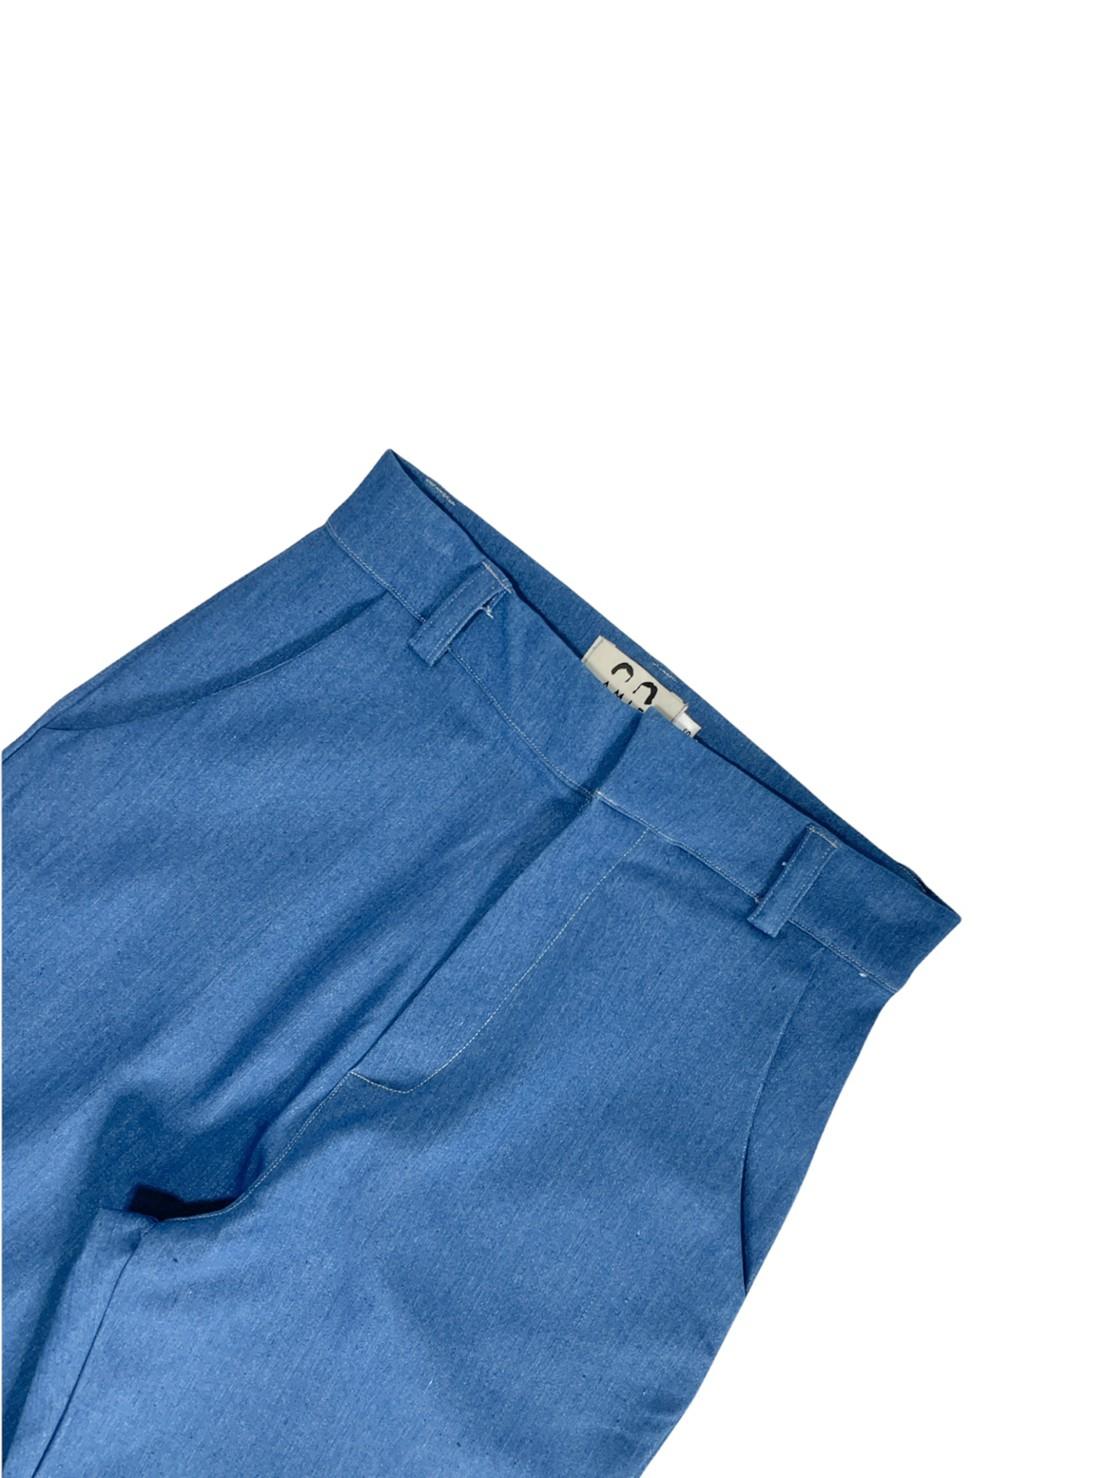 AMIE basic pants (Light Blue)